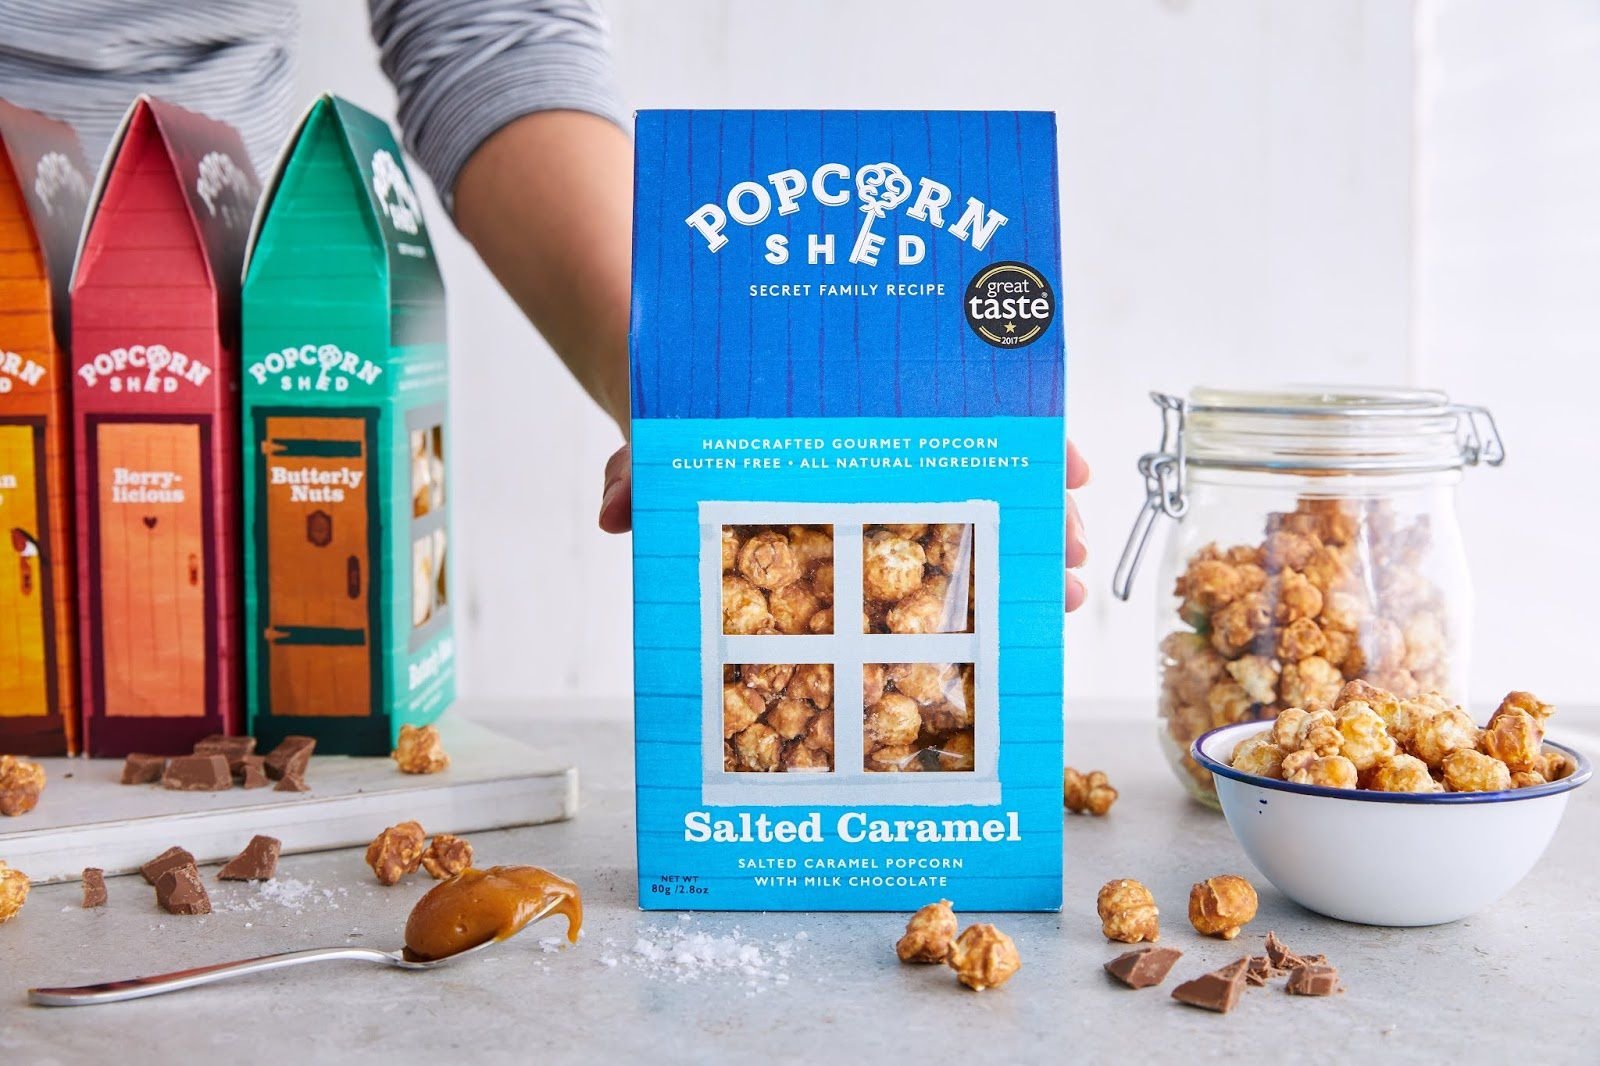 Popcorn Shed (popcorn gourmet aromatisé) I Design : Martyn Garrod, Londres, Royaume-Uni (juin 2018)